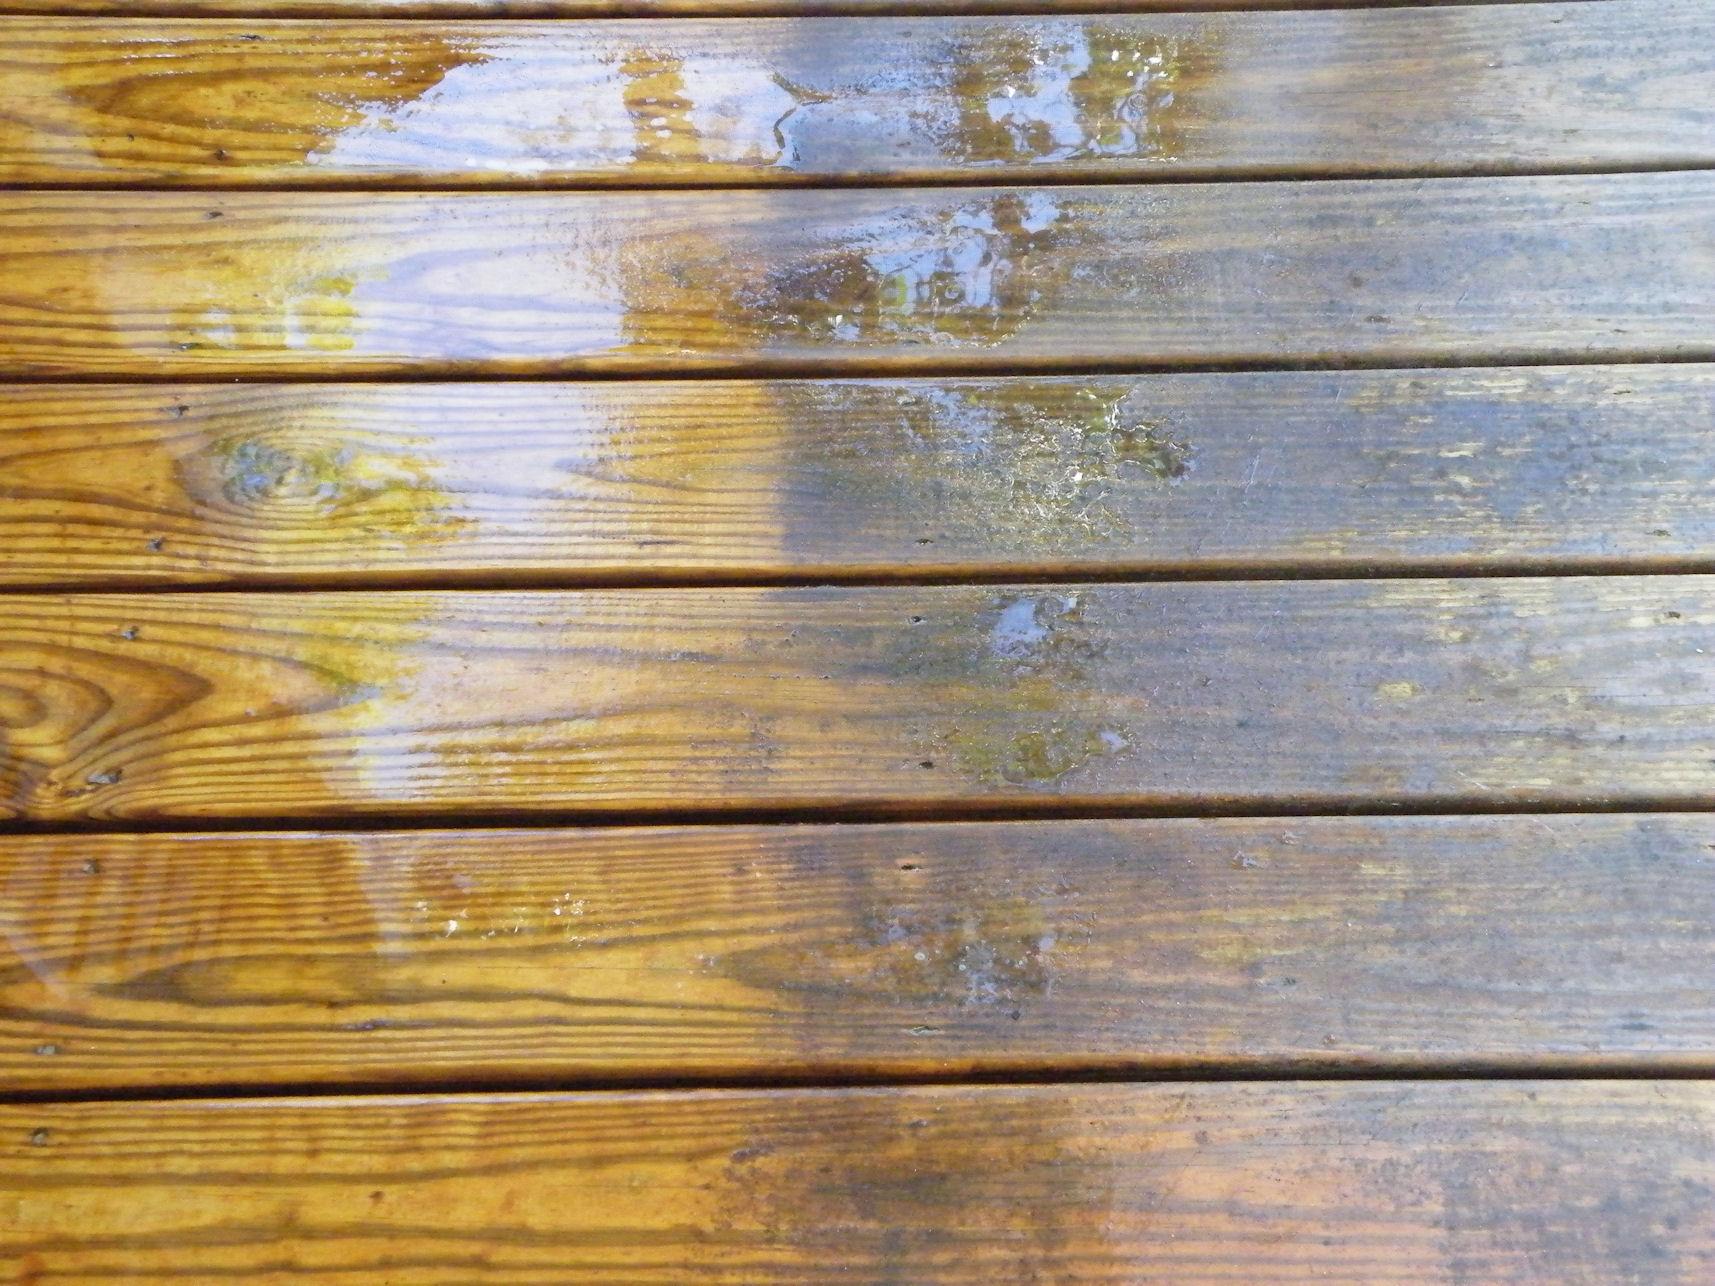 Fowler's Deck